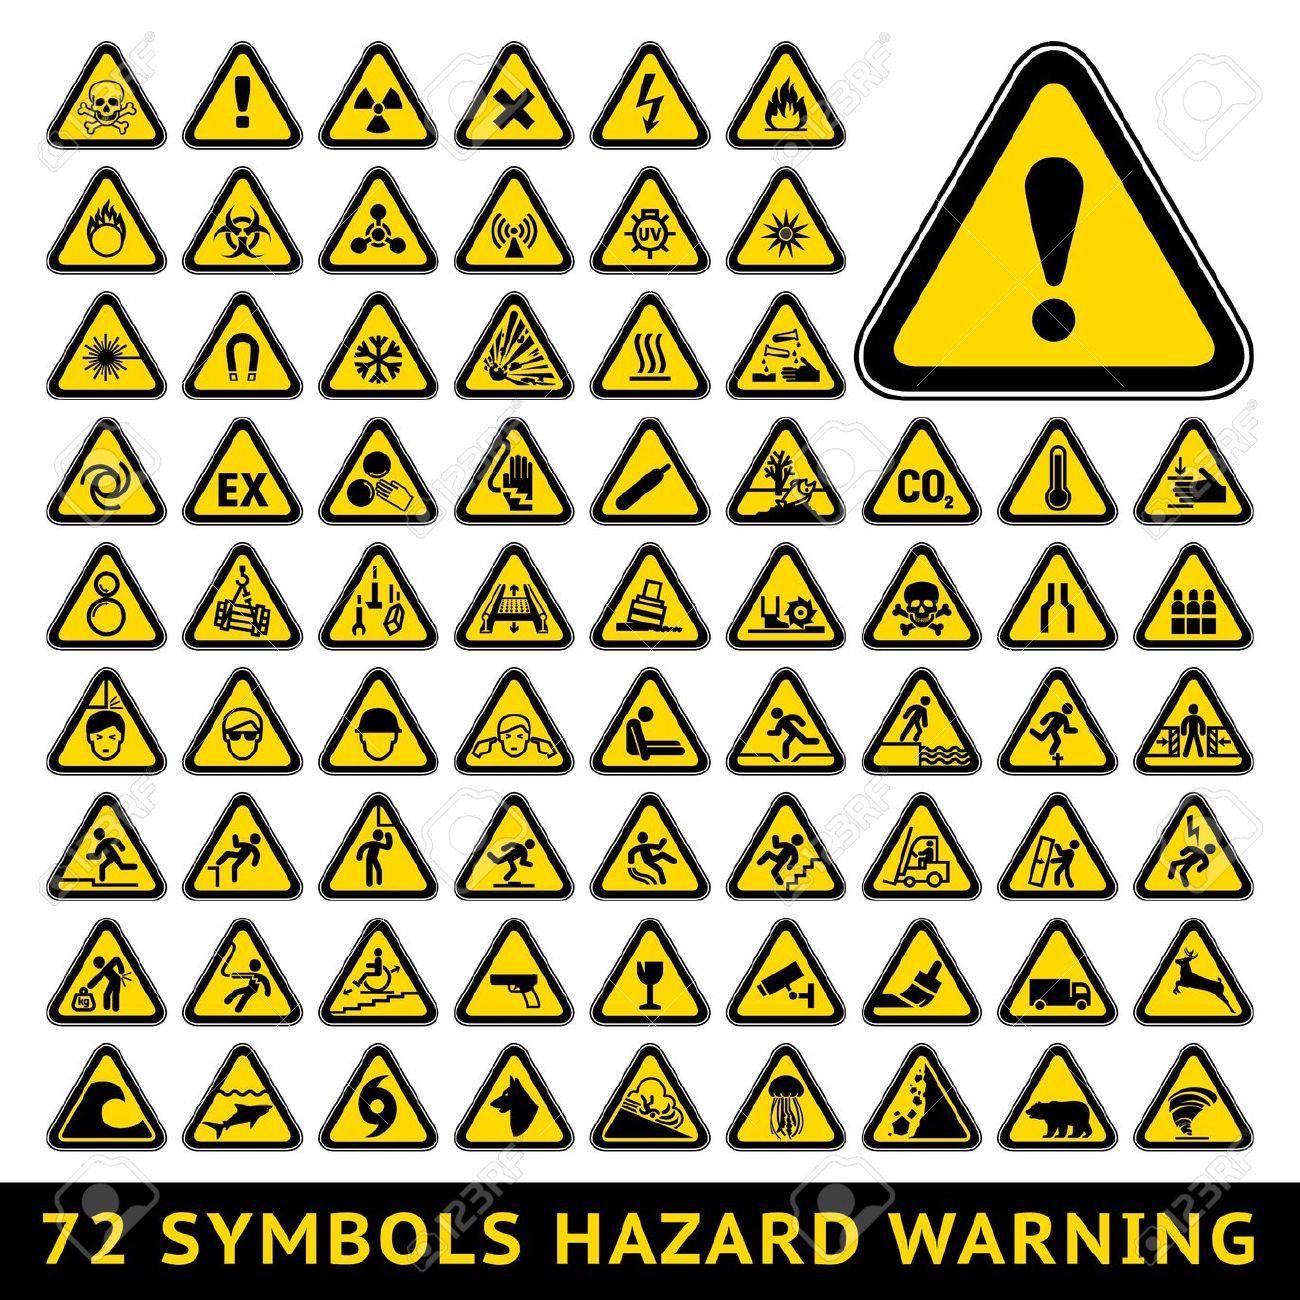 Warning Symbols Hand Google Search Put On The Kids 100th Day Shirt